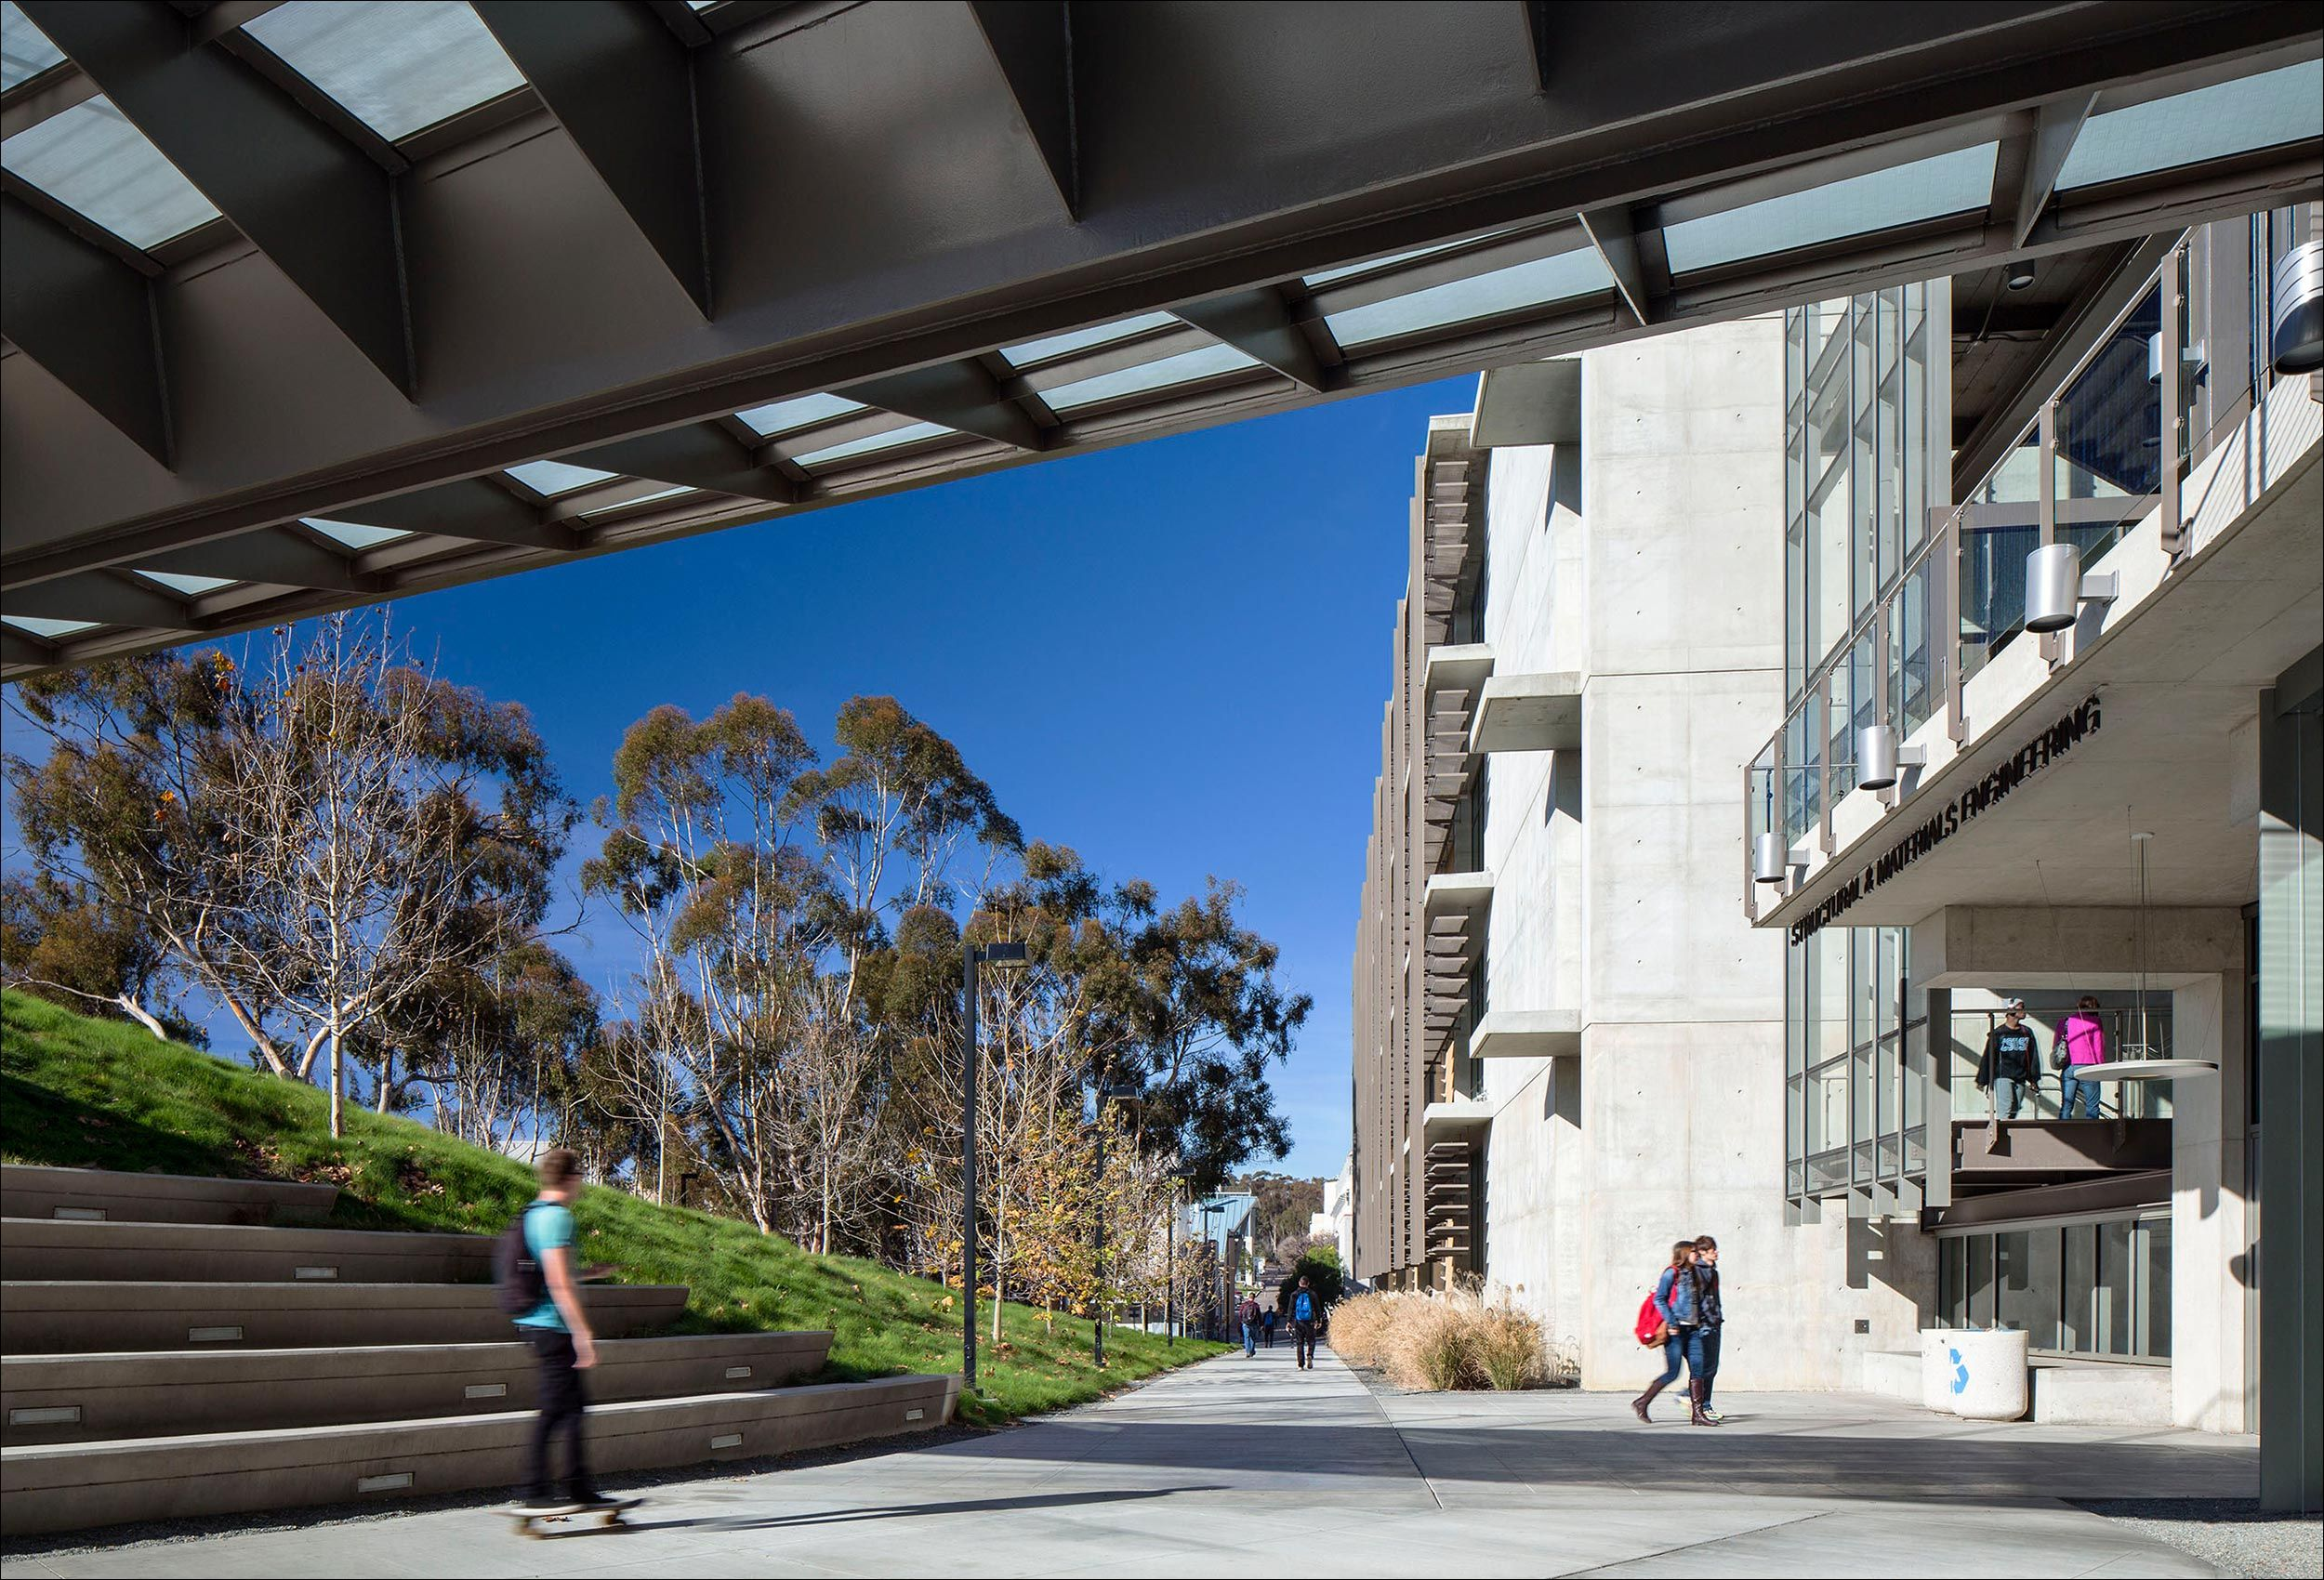 MillerHullArchitects_UCSanDiego_University_ArchitecturalPhotography.jpg